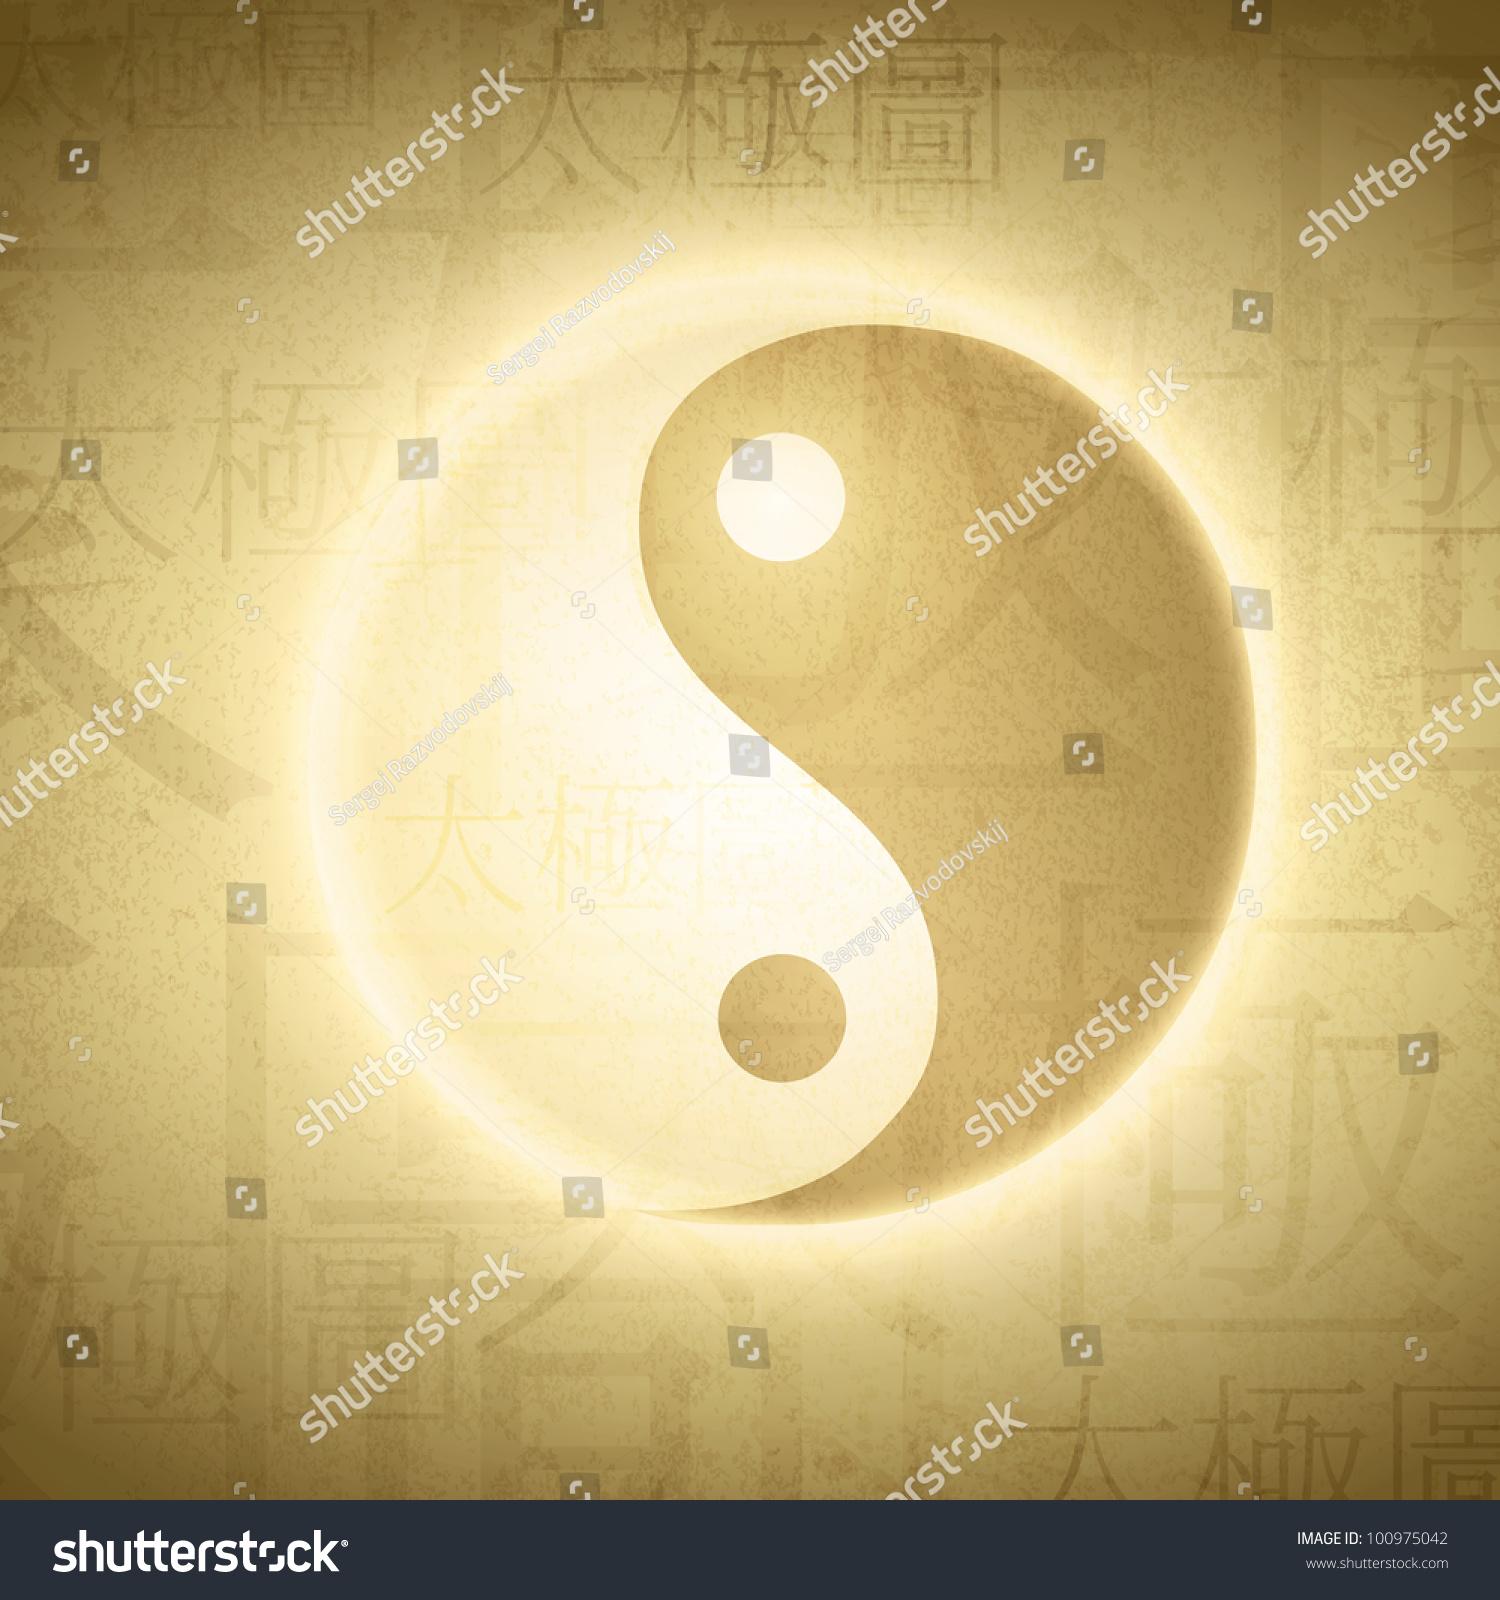 The yin yang school essay